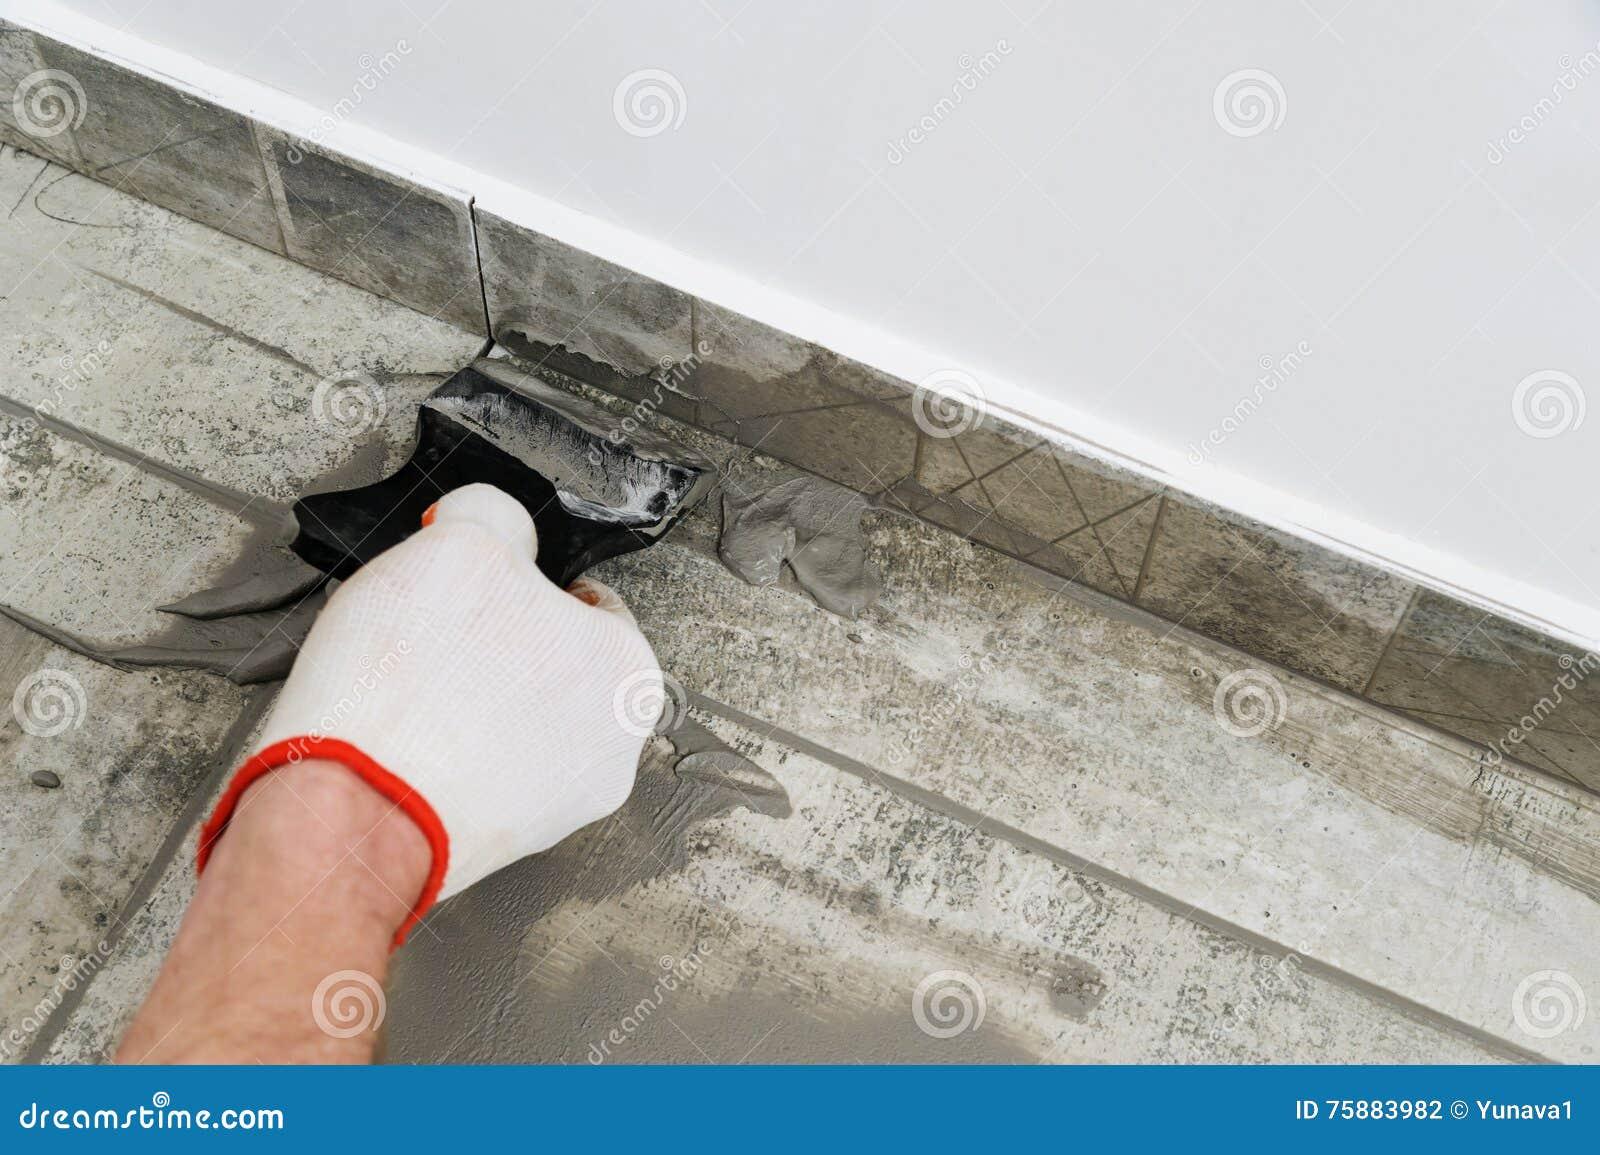 Grouting Ceramic Tiles Stock Photo Image Of Tiles Flooring 75883982